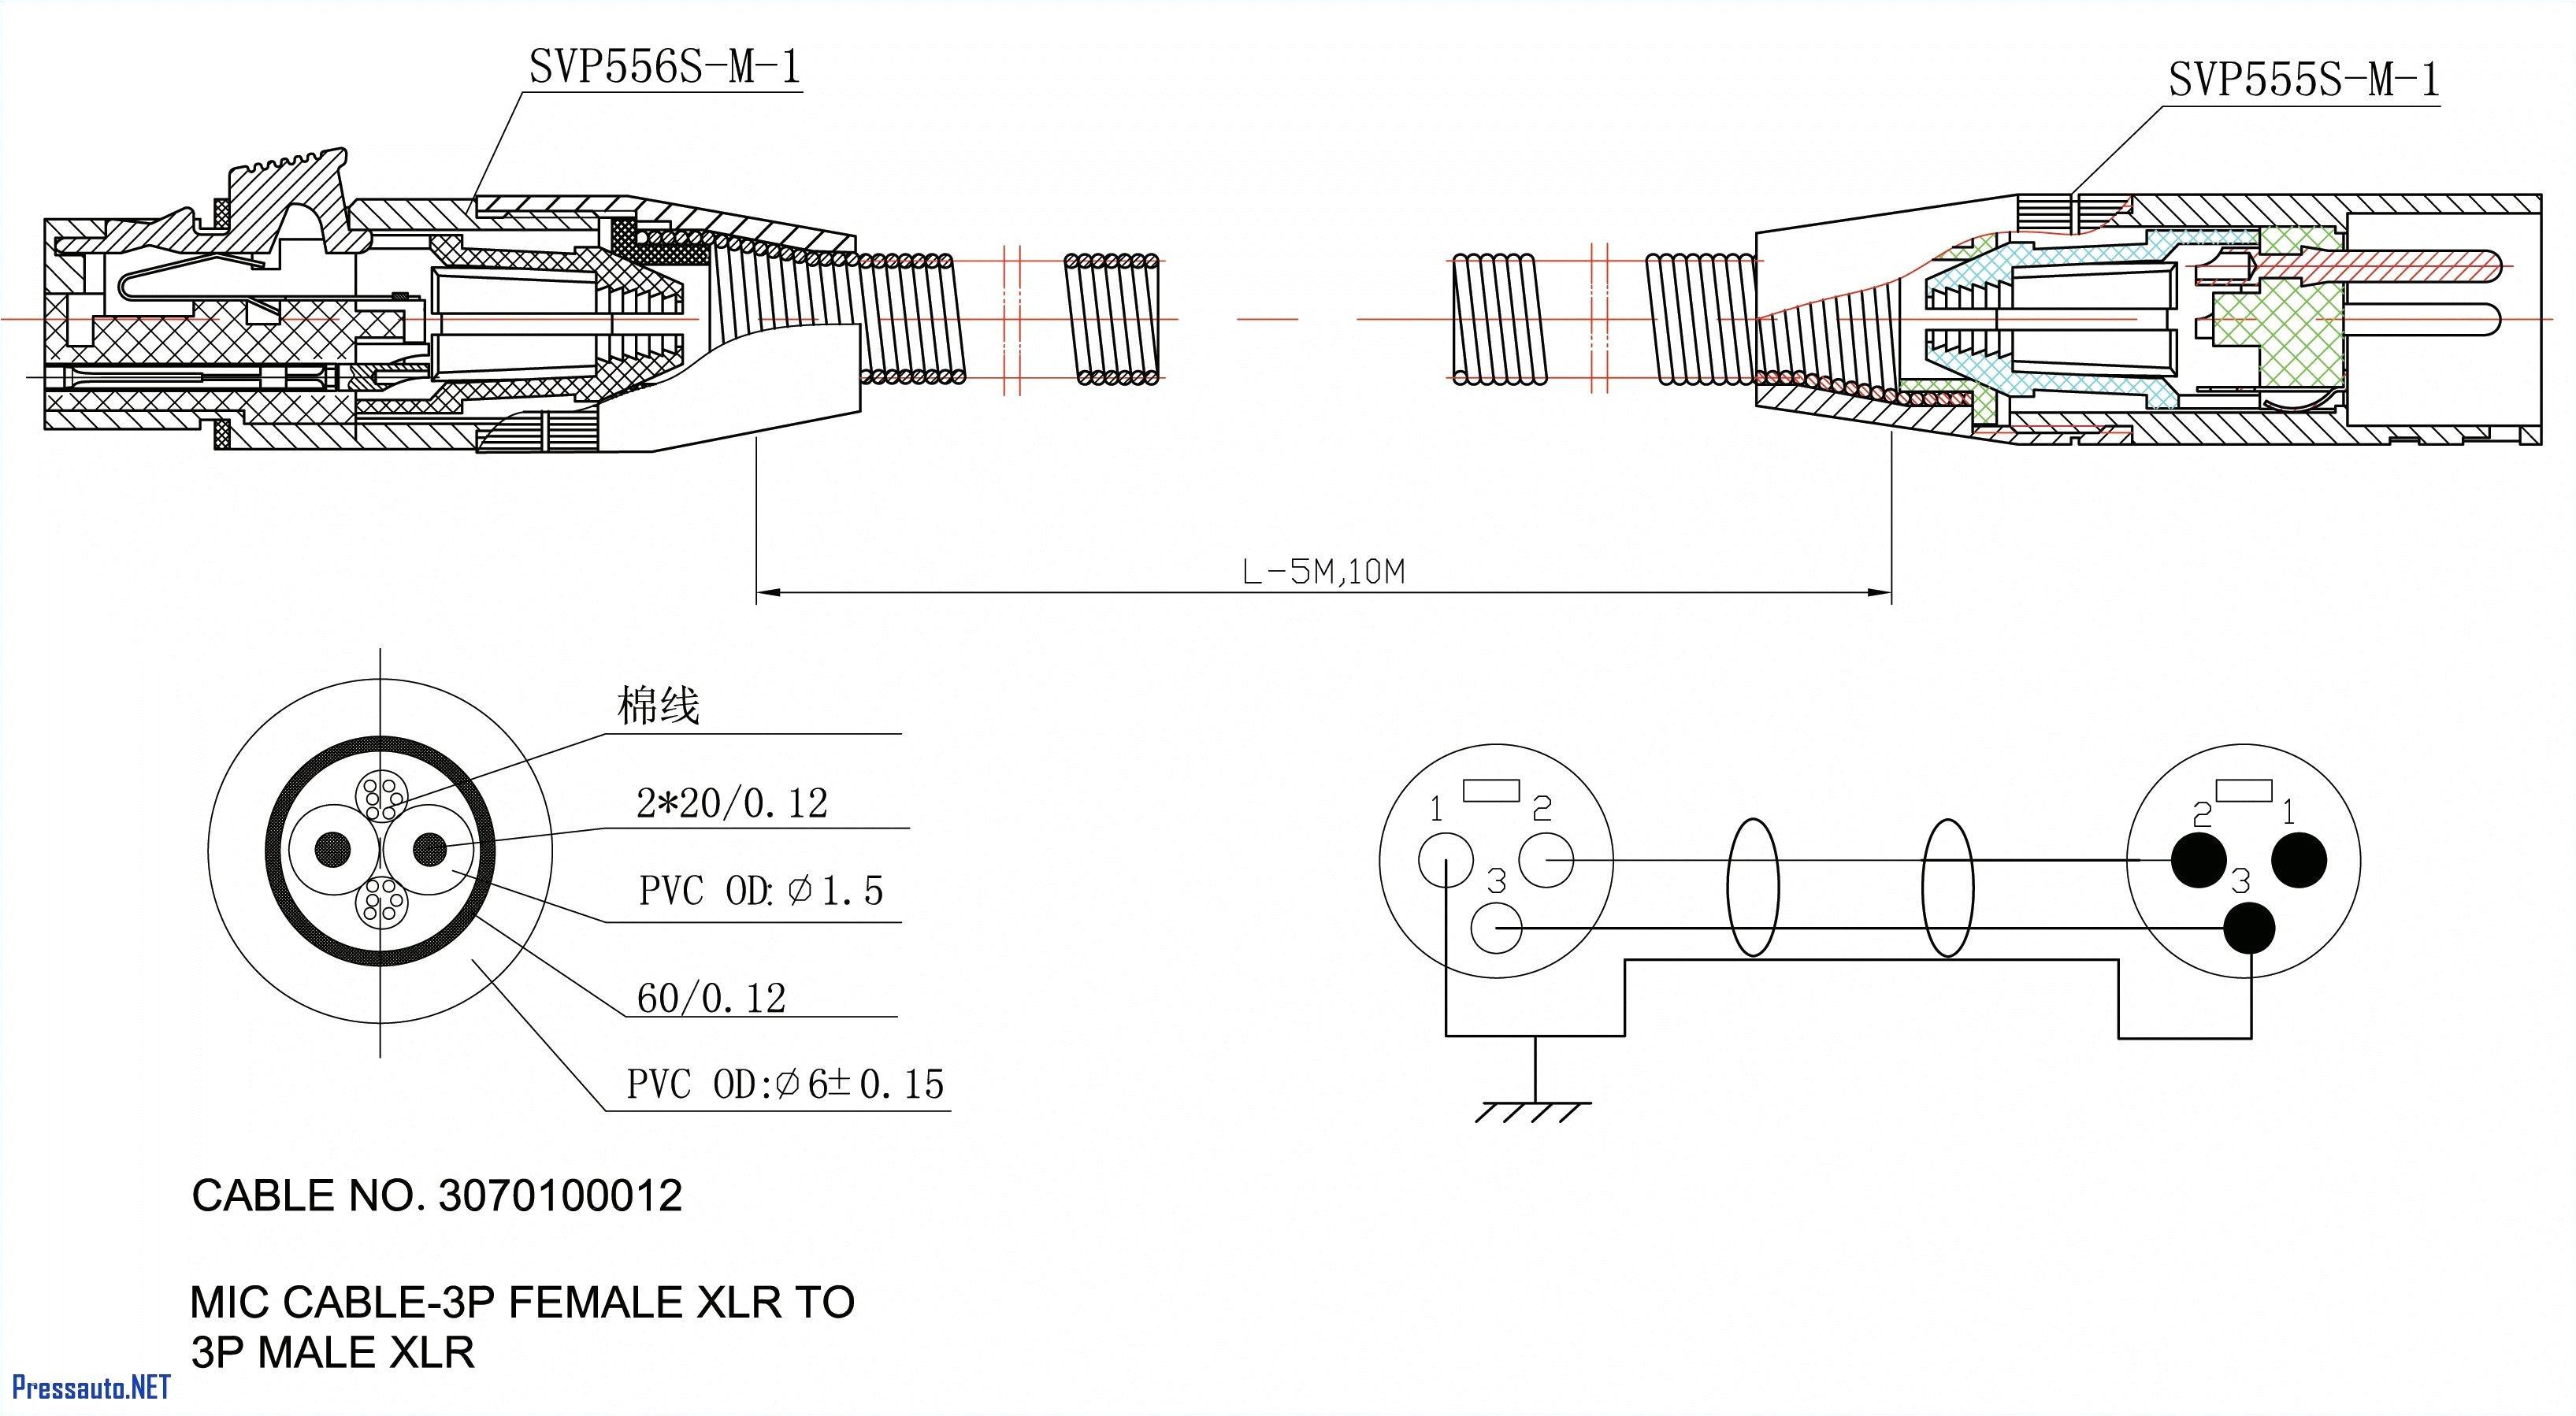 1966 Chevy C10 Wiring Diagram Wiring Indicator Diagram Light R9 86l Wiring Diagram Sys